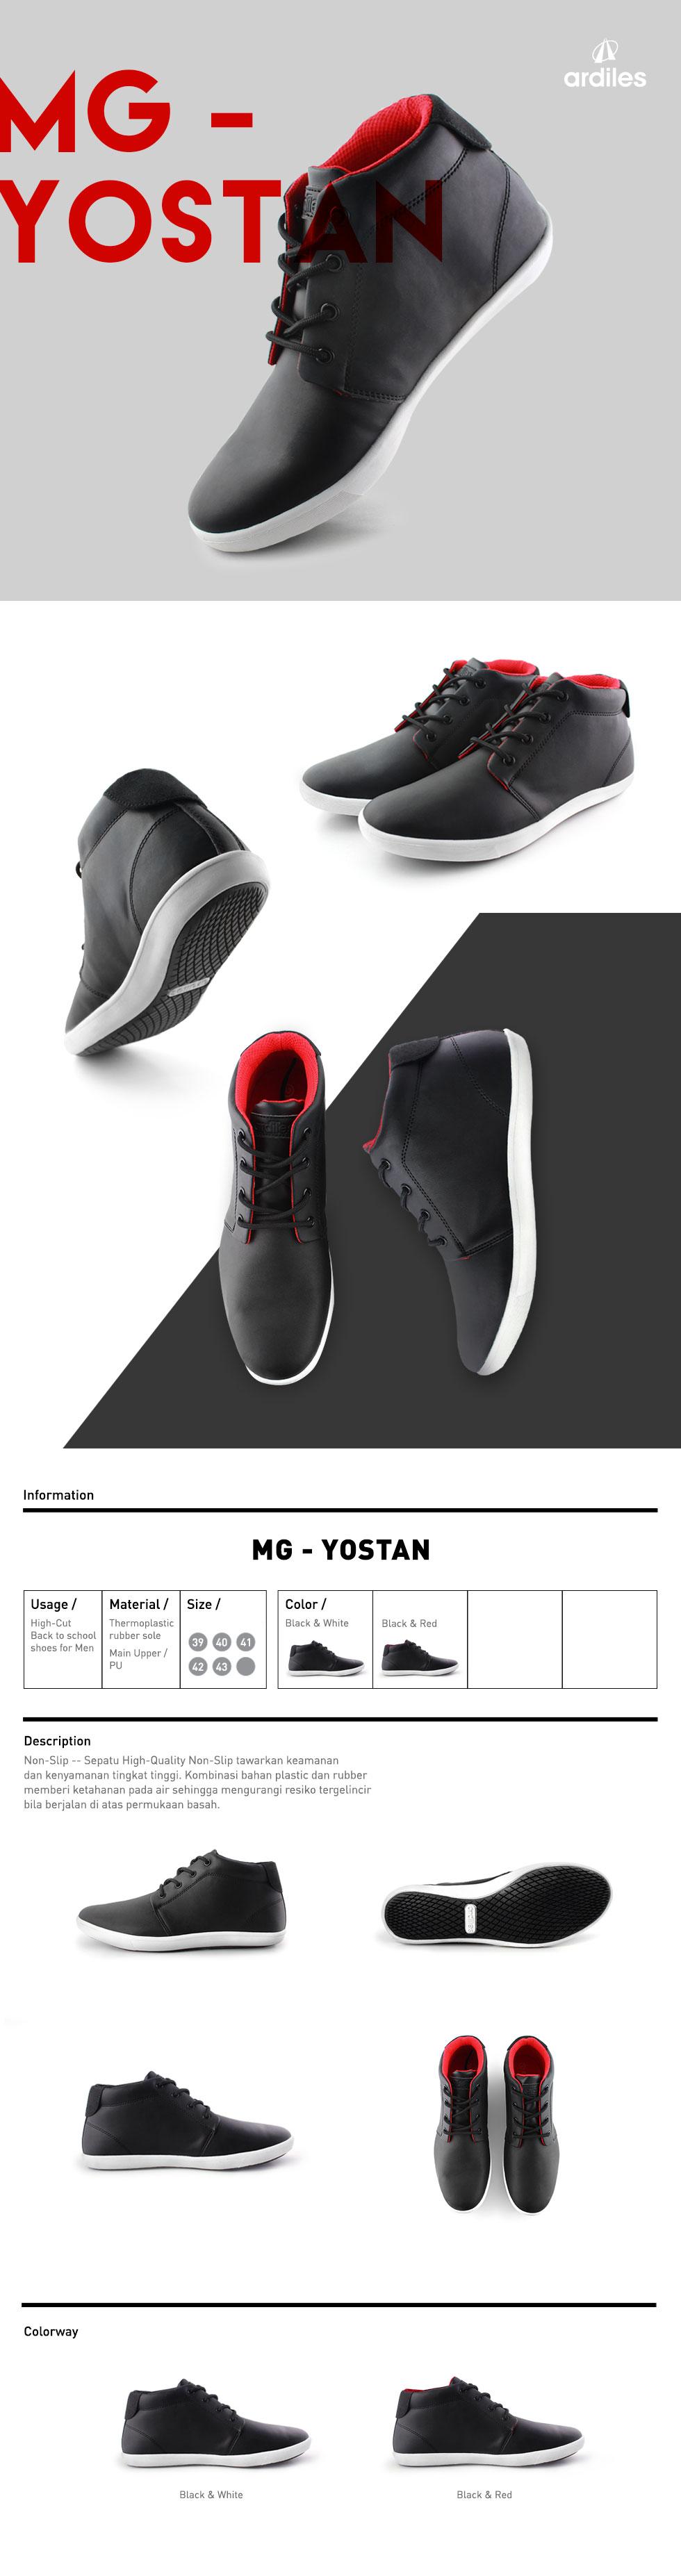 Buy Free Ongkir Ardiles Shoes Men And Women Sepatu Special Articuno Running Grey Black Opsi